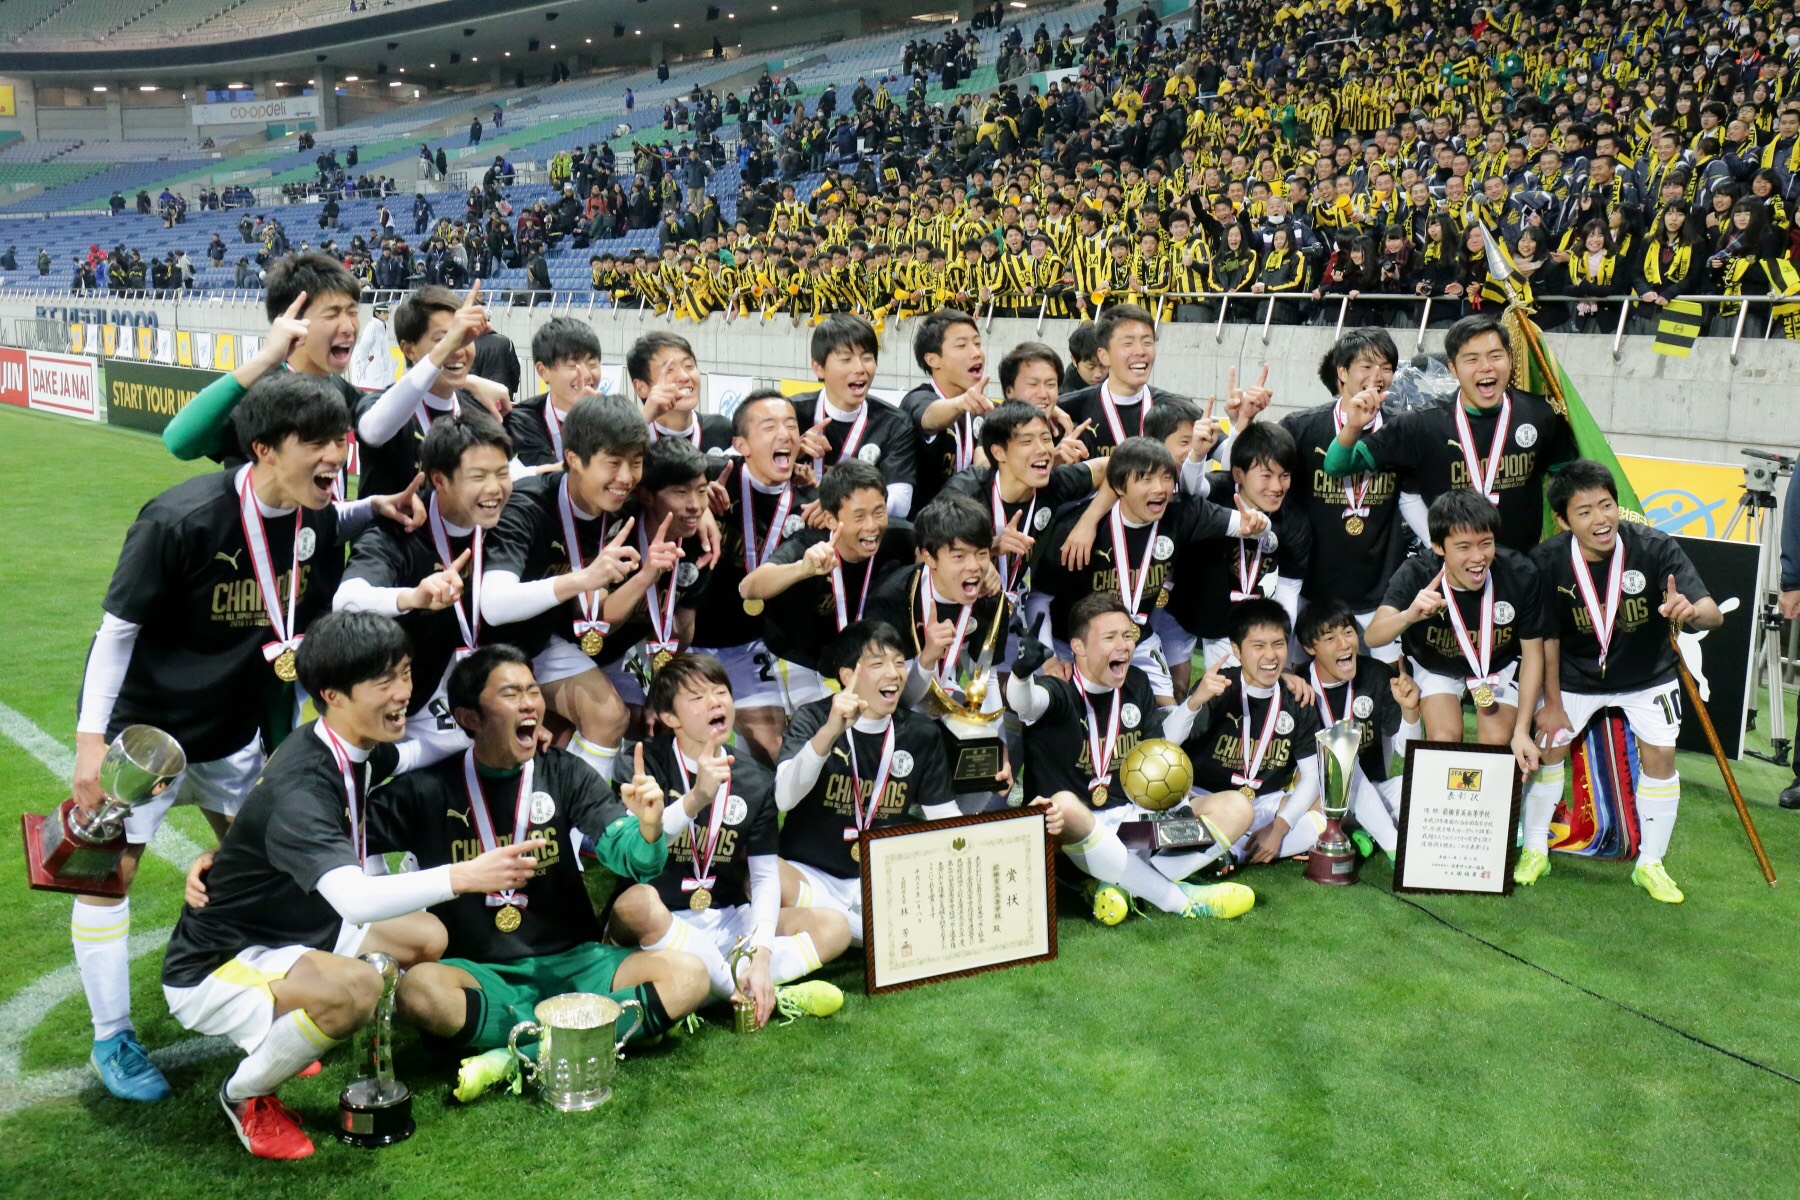 第96回全国高校サッカー選手権 決勝戦